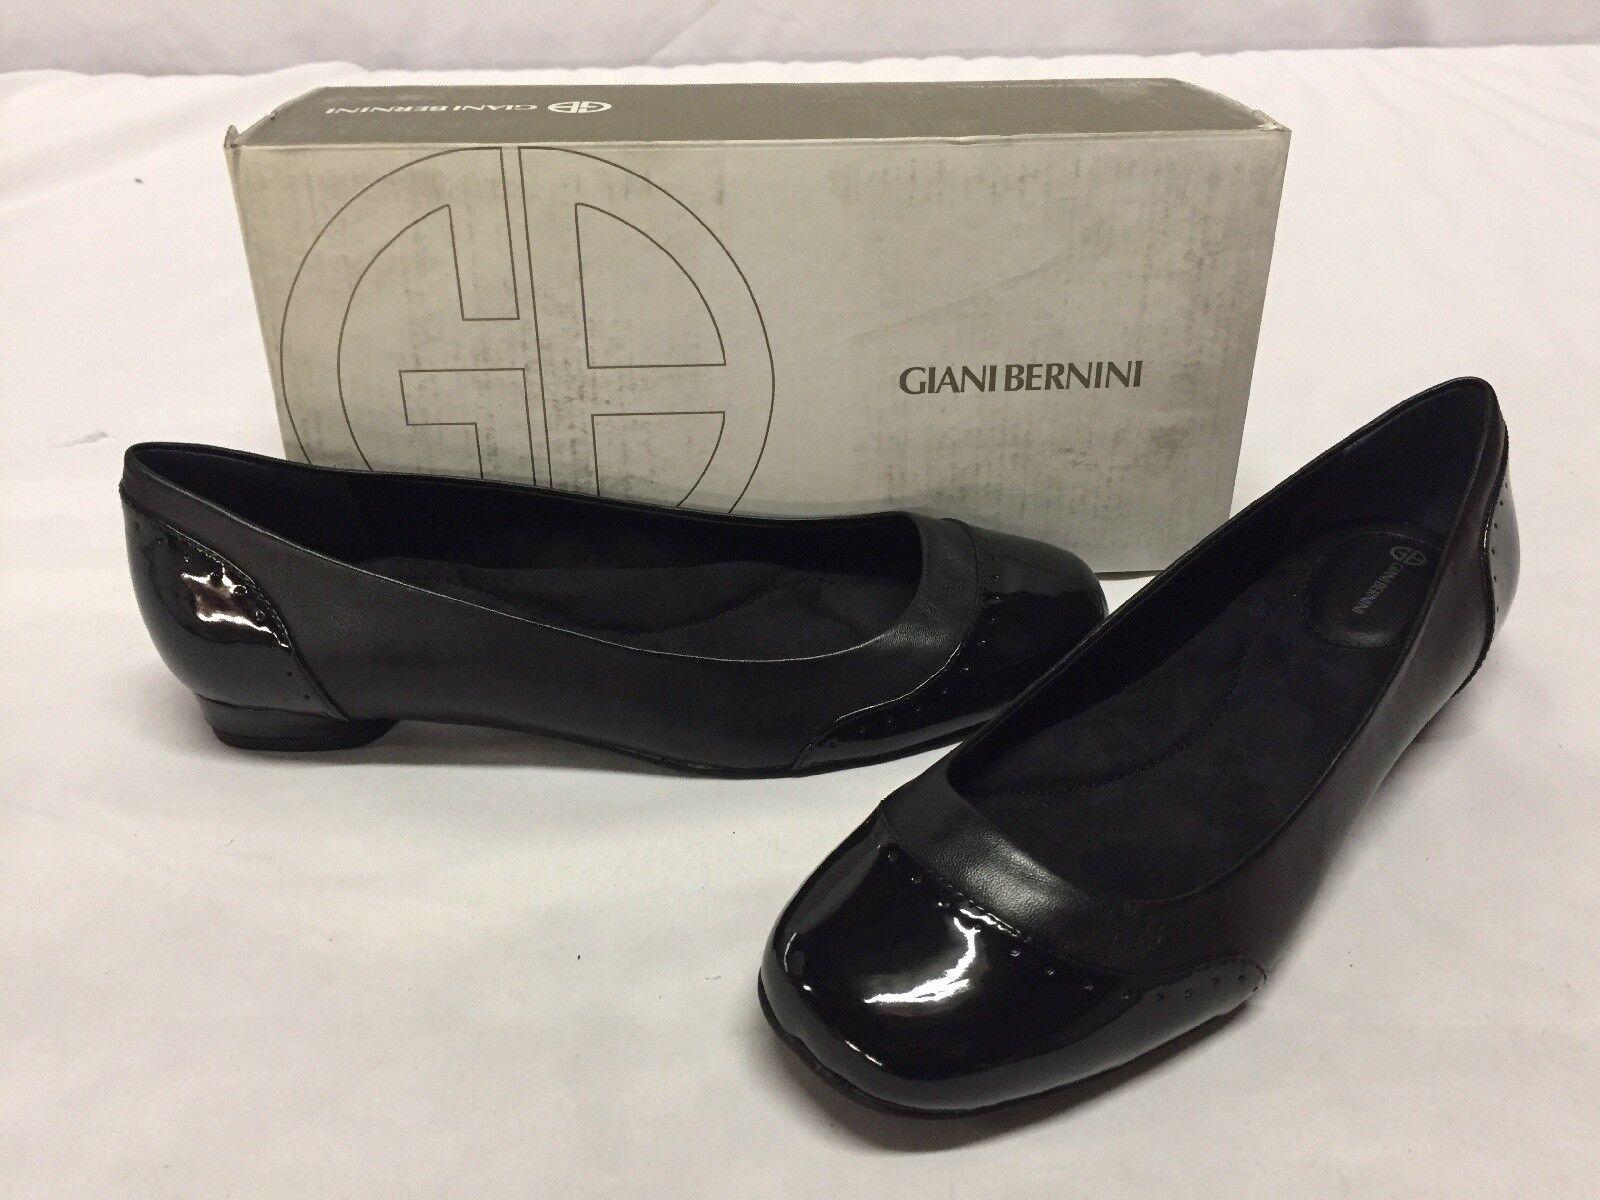 Giani Bernini Mirto para Mujeres Zapatos Planos, Negro, Talla 9.5 9.5 9.5 M  precios ultra bajos